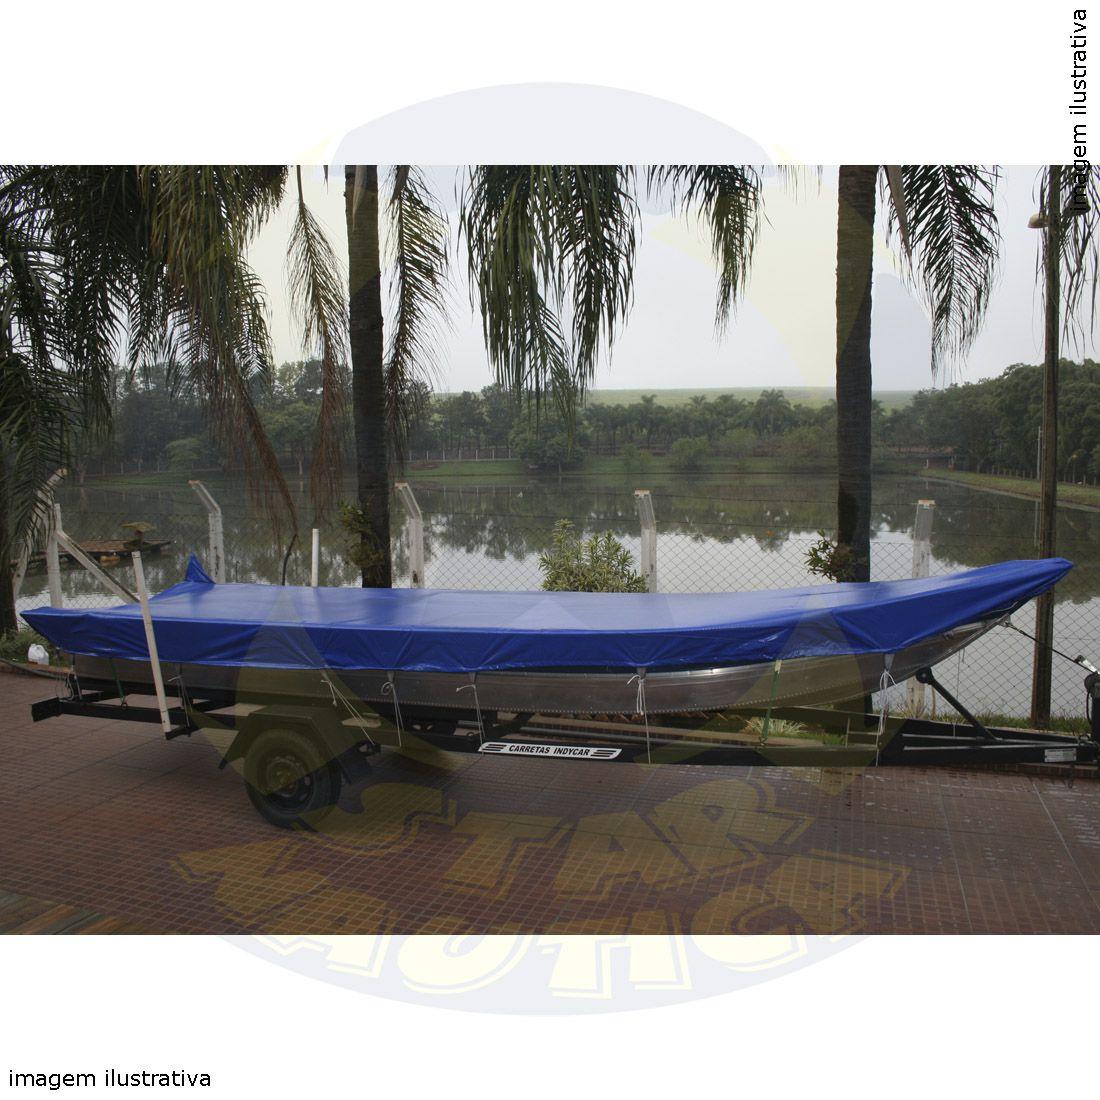 Capa Lona de Cobertura Barco Marujo 500 Lona Vinílica